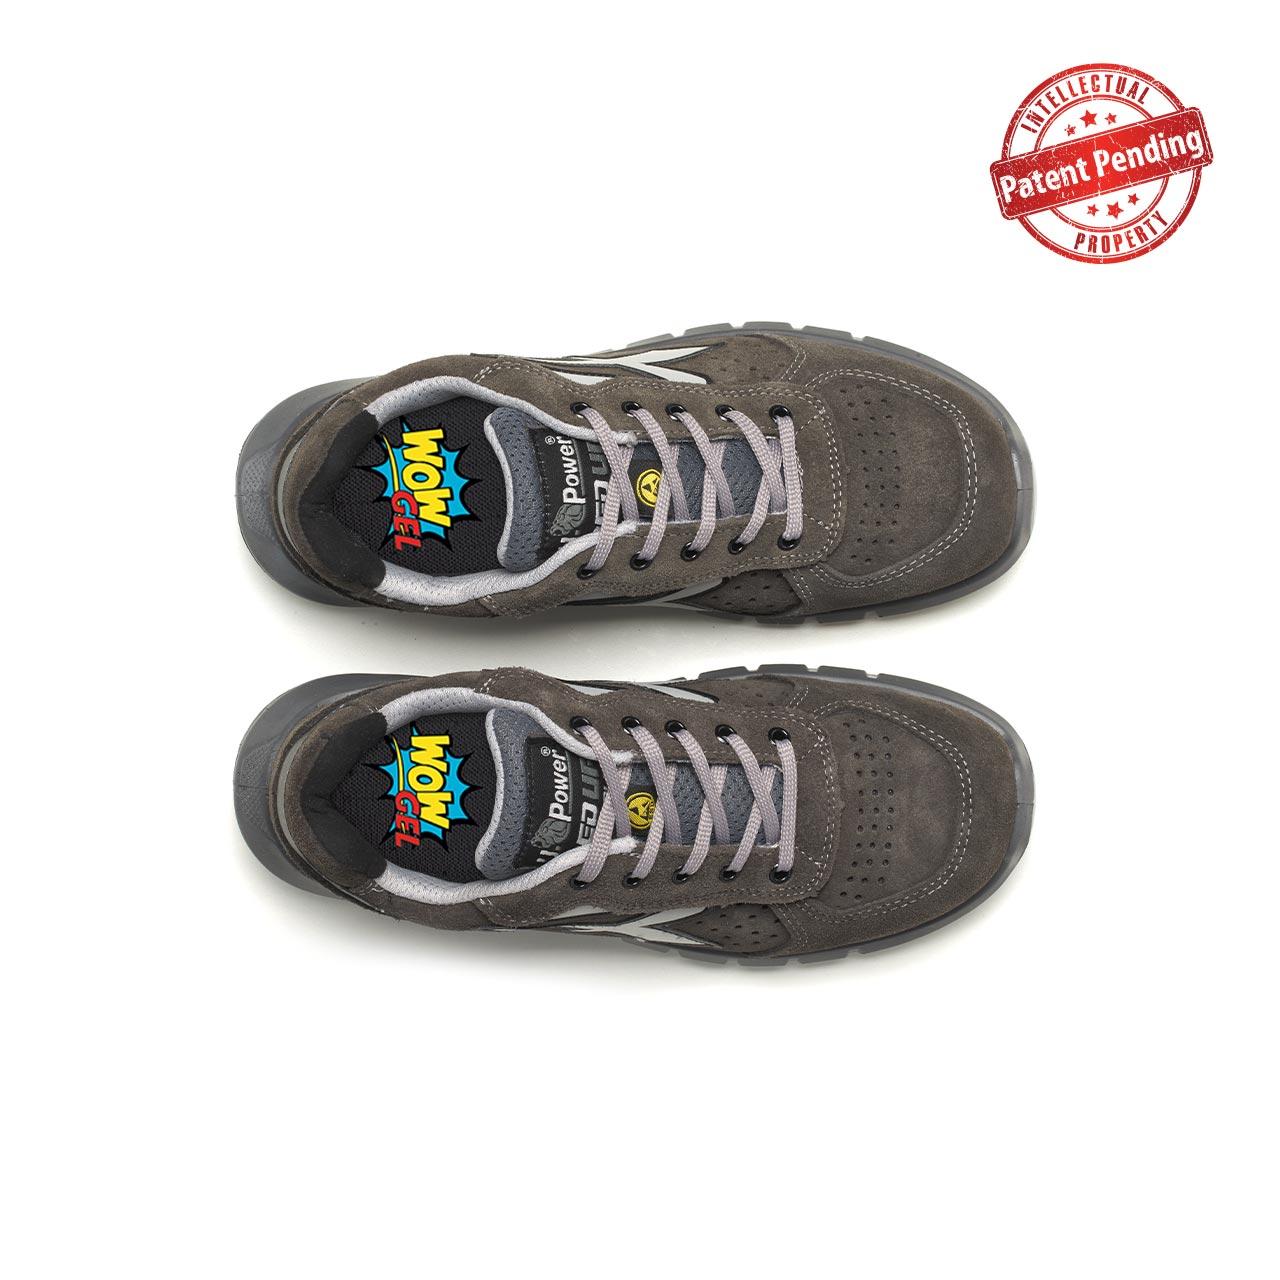 paio di scarpe antinfortunistiche upower modello rigel plus linea redup plus vista top